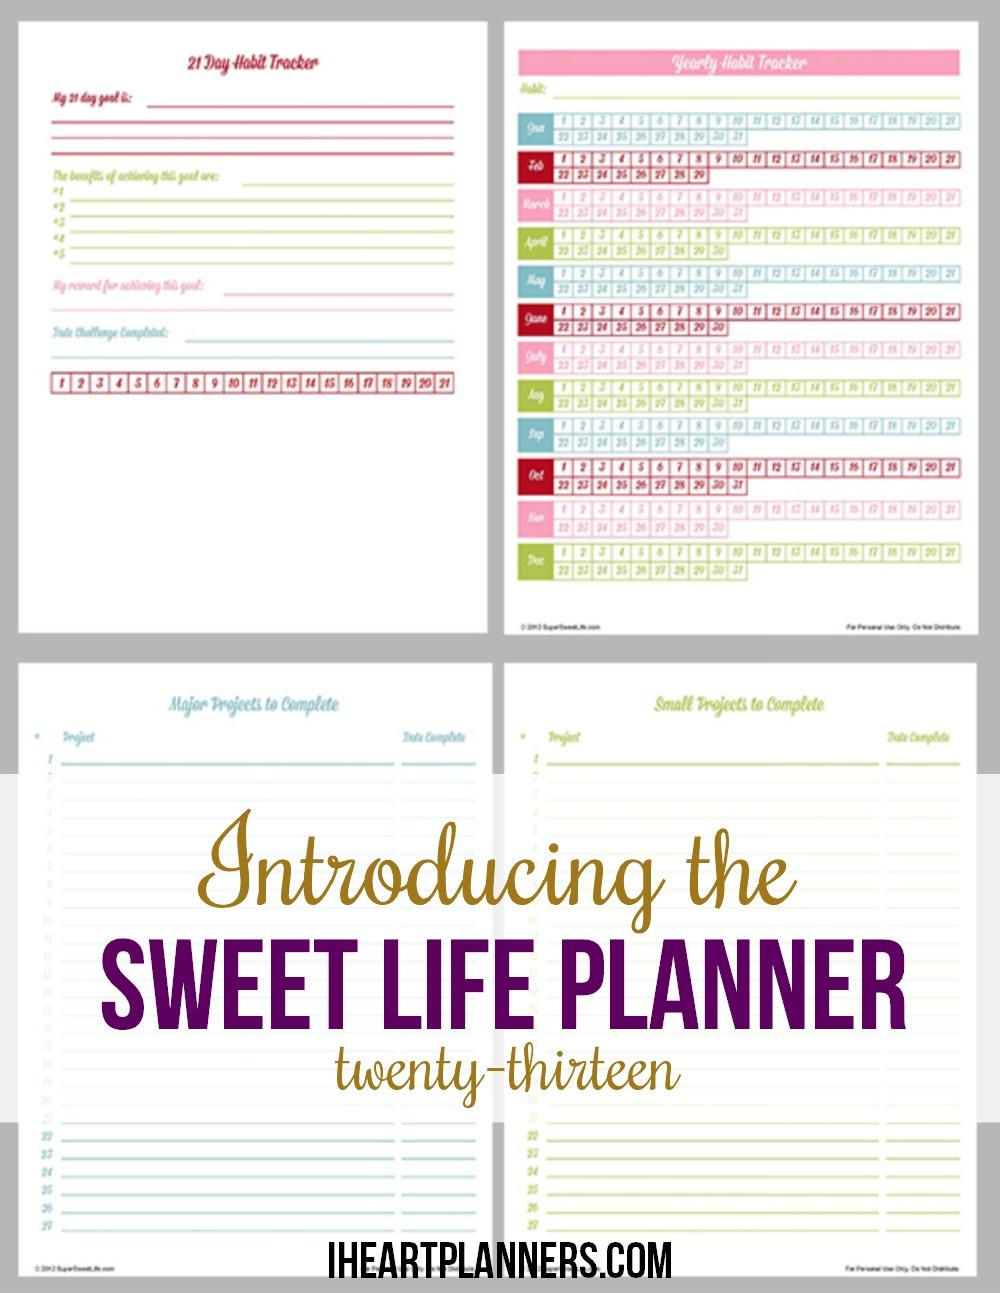 Calendar For 2013 Free Printable 2013 Calendar Online Printable 2013 Holiday Calendar Organizing Printables And The Sweet Life Planner 2013